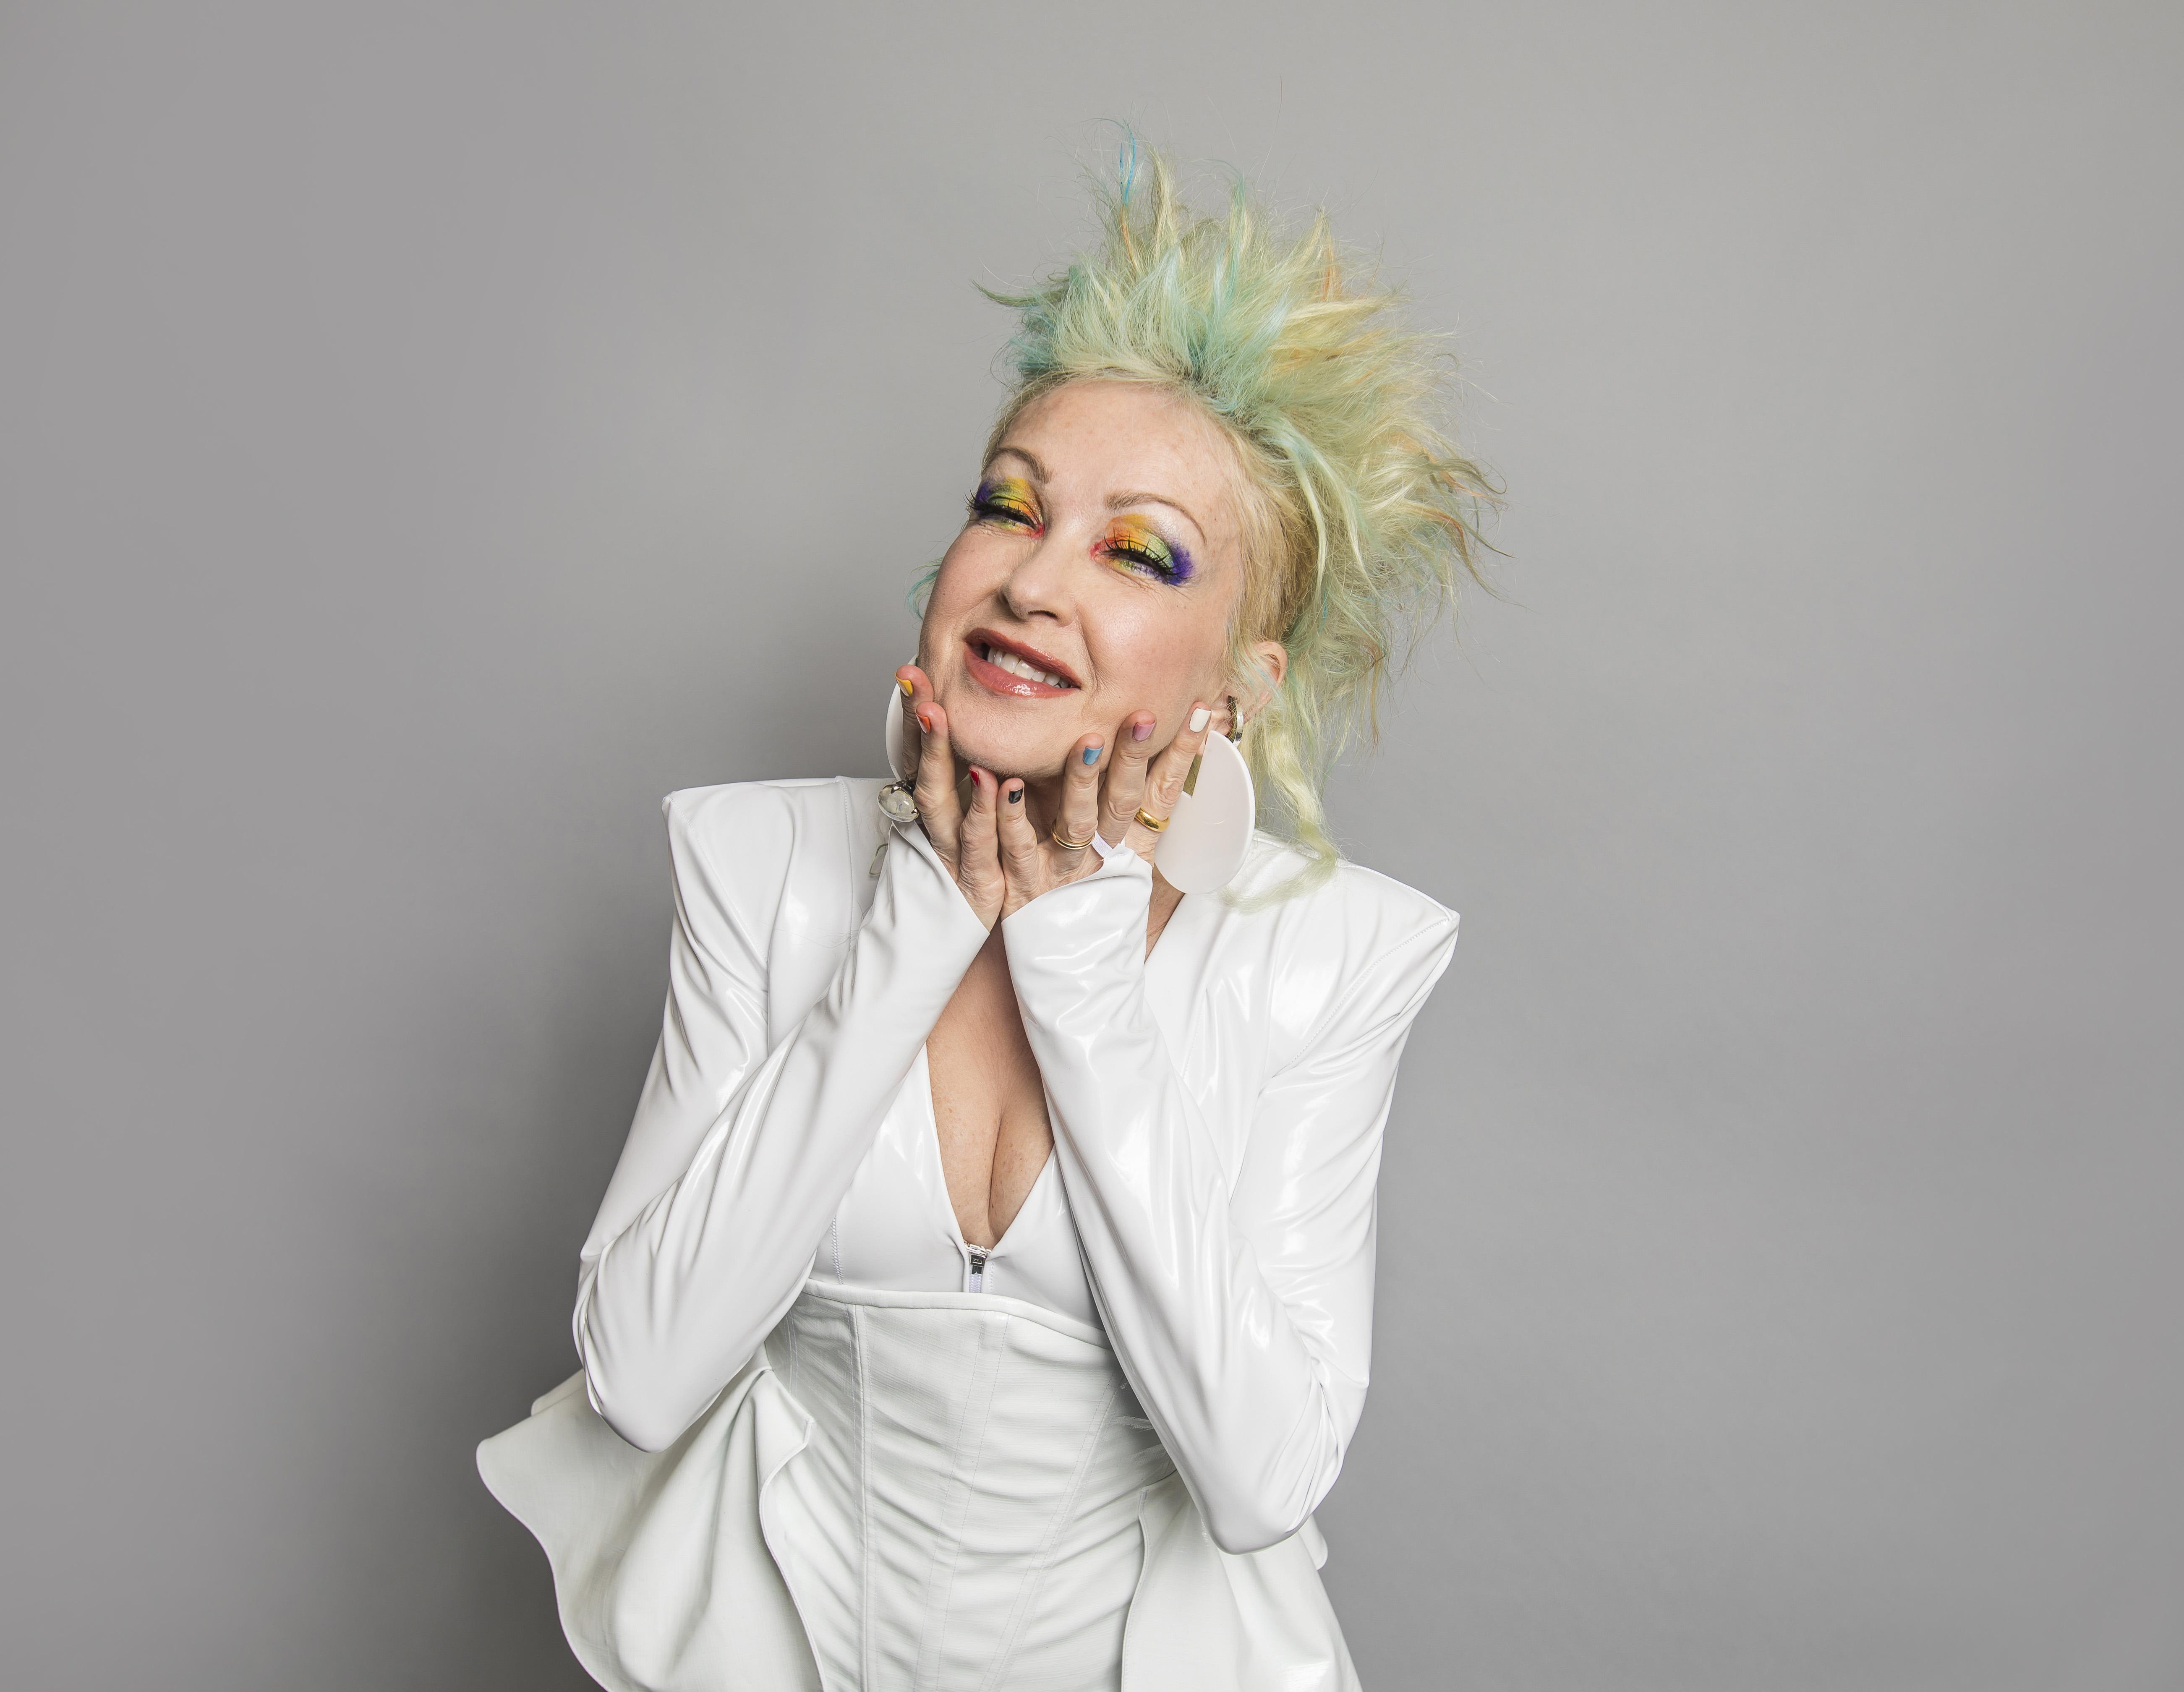 Singer Songwriter Cyndi Lauper